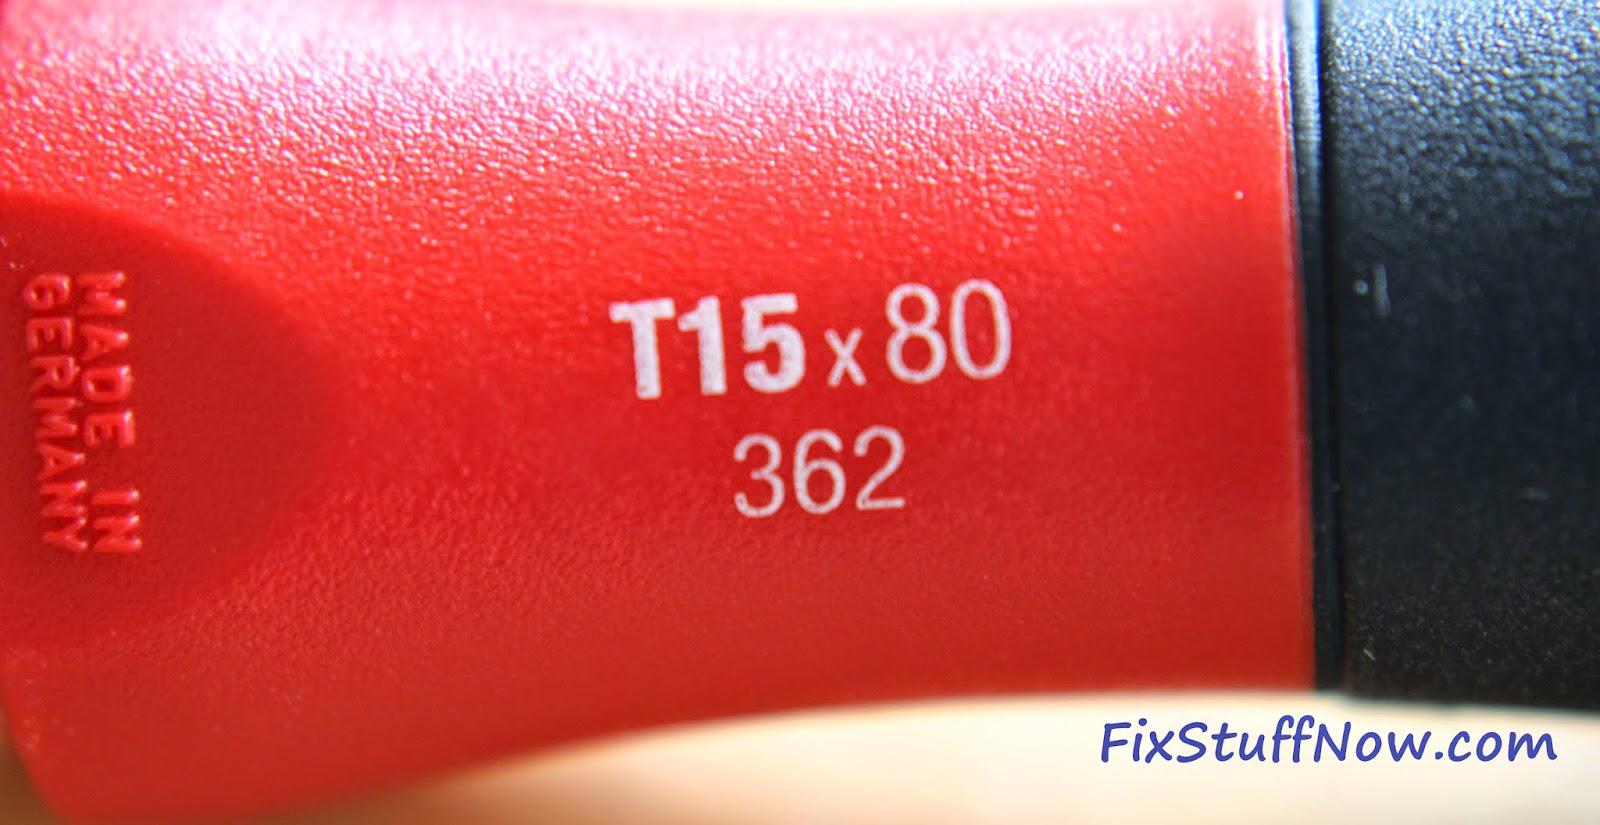 Wiha 36291 Torx Screwdriver Set - Closeup Of Marking